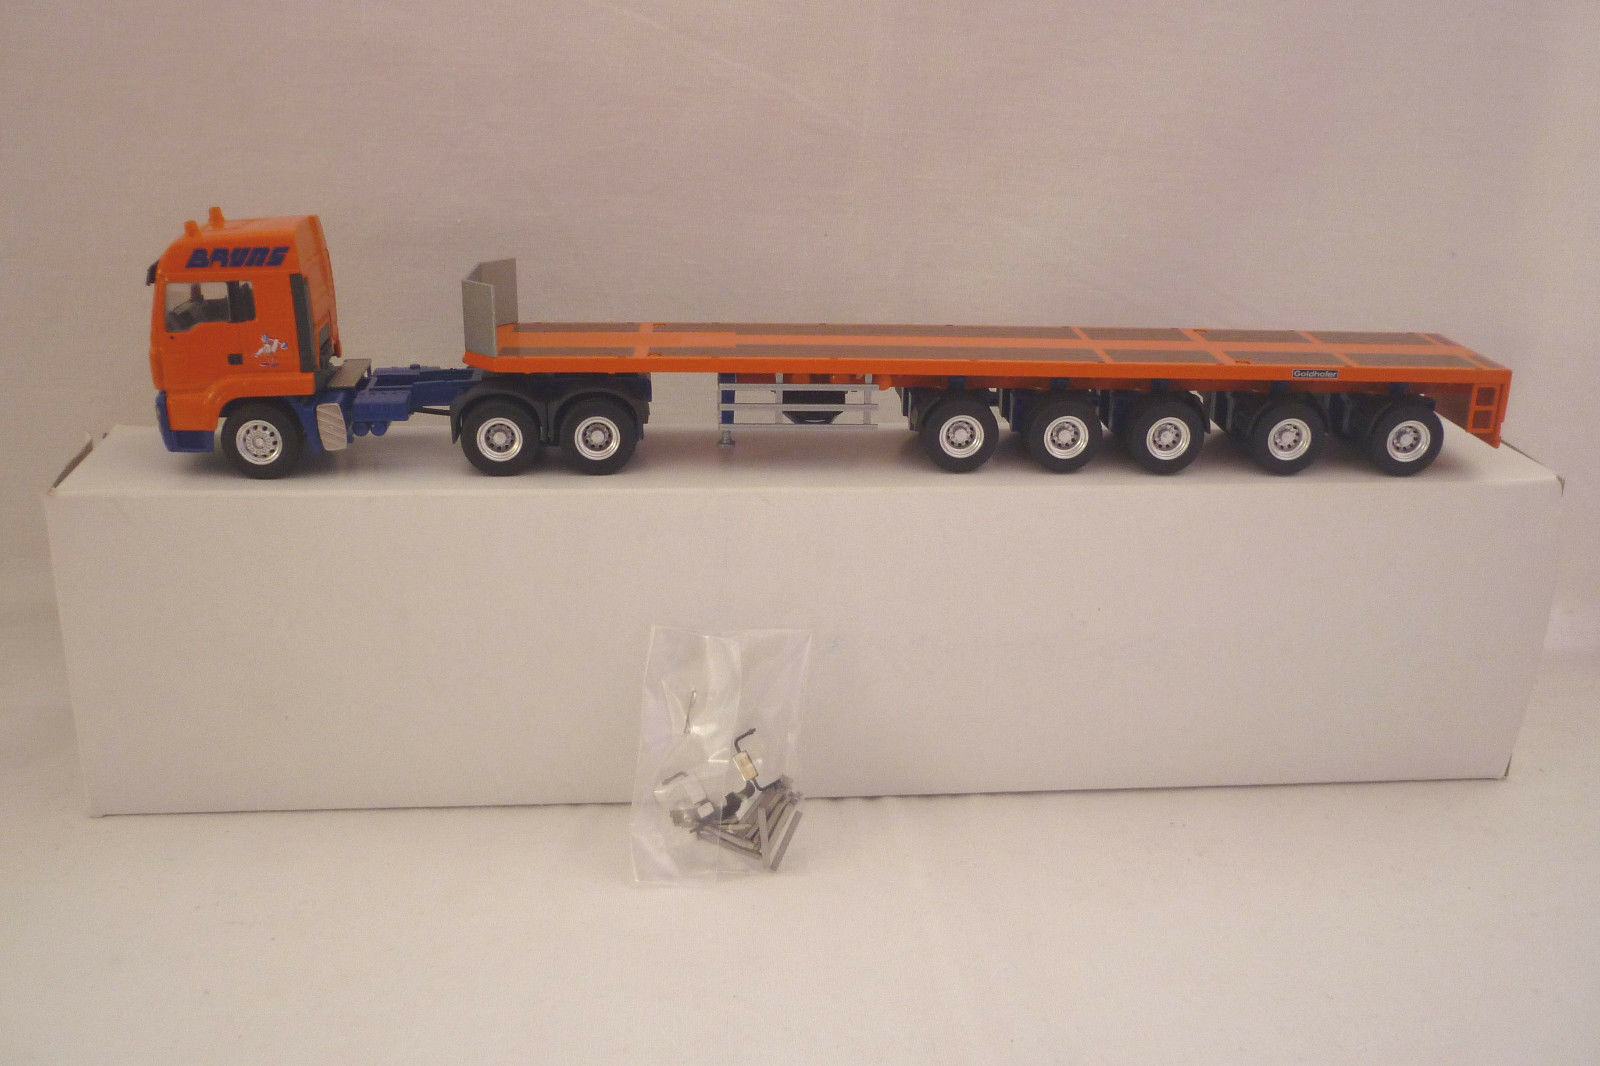 Conrad-Metal model-homme TGA  l37 Ballast Bridge-Original Box - 1 50 (7.bm-217)  bienvenue pour acheter